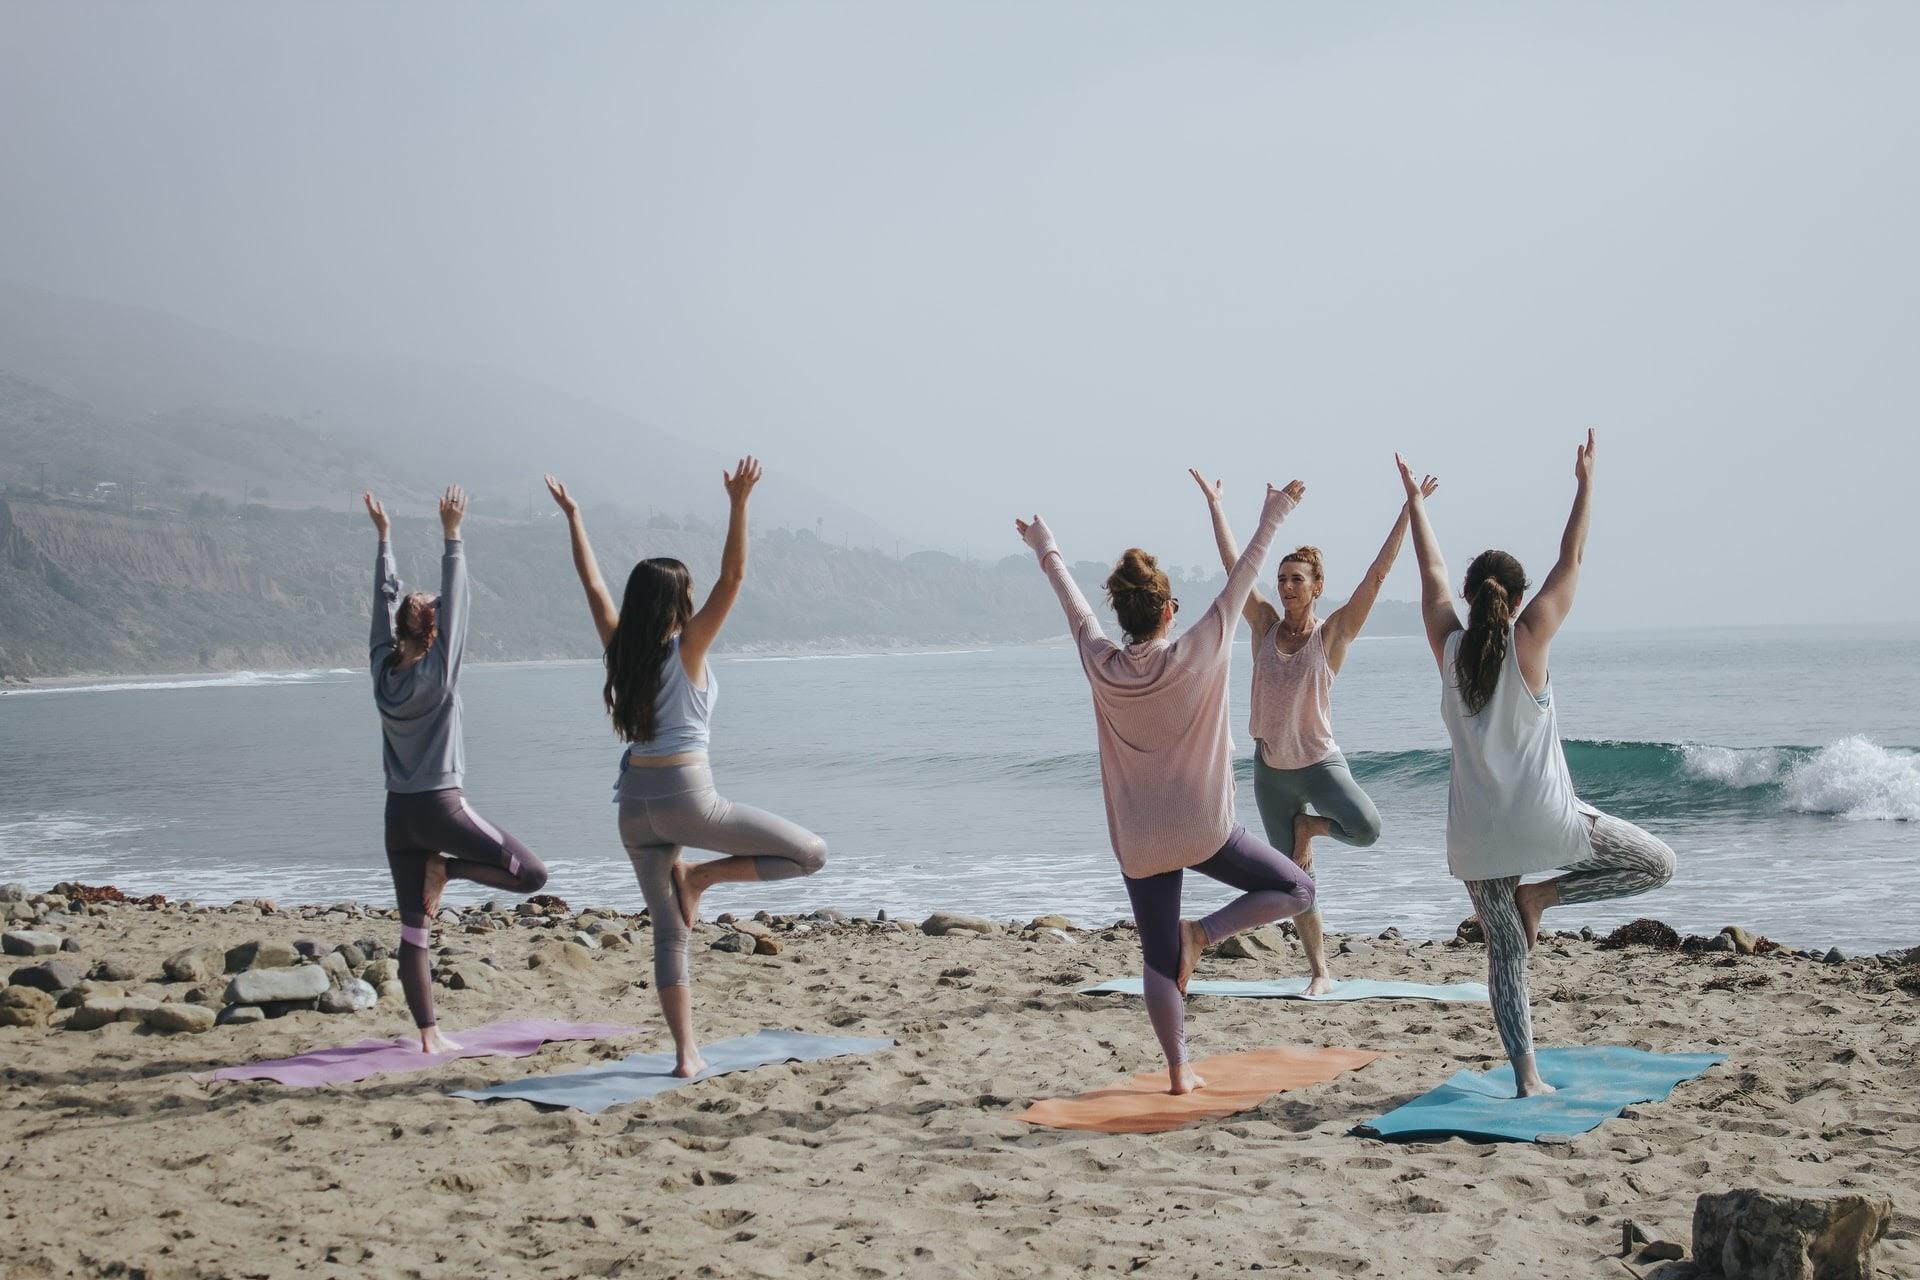 five women on a beach doing yoga